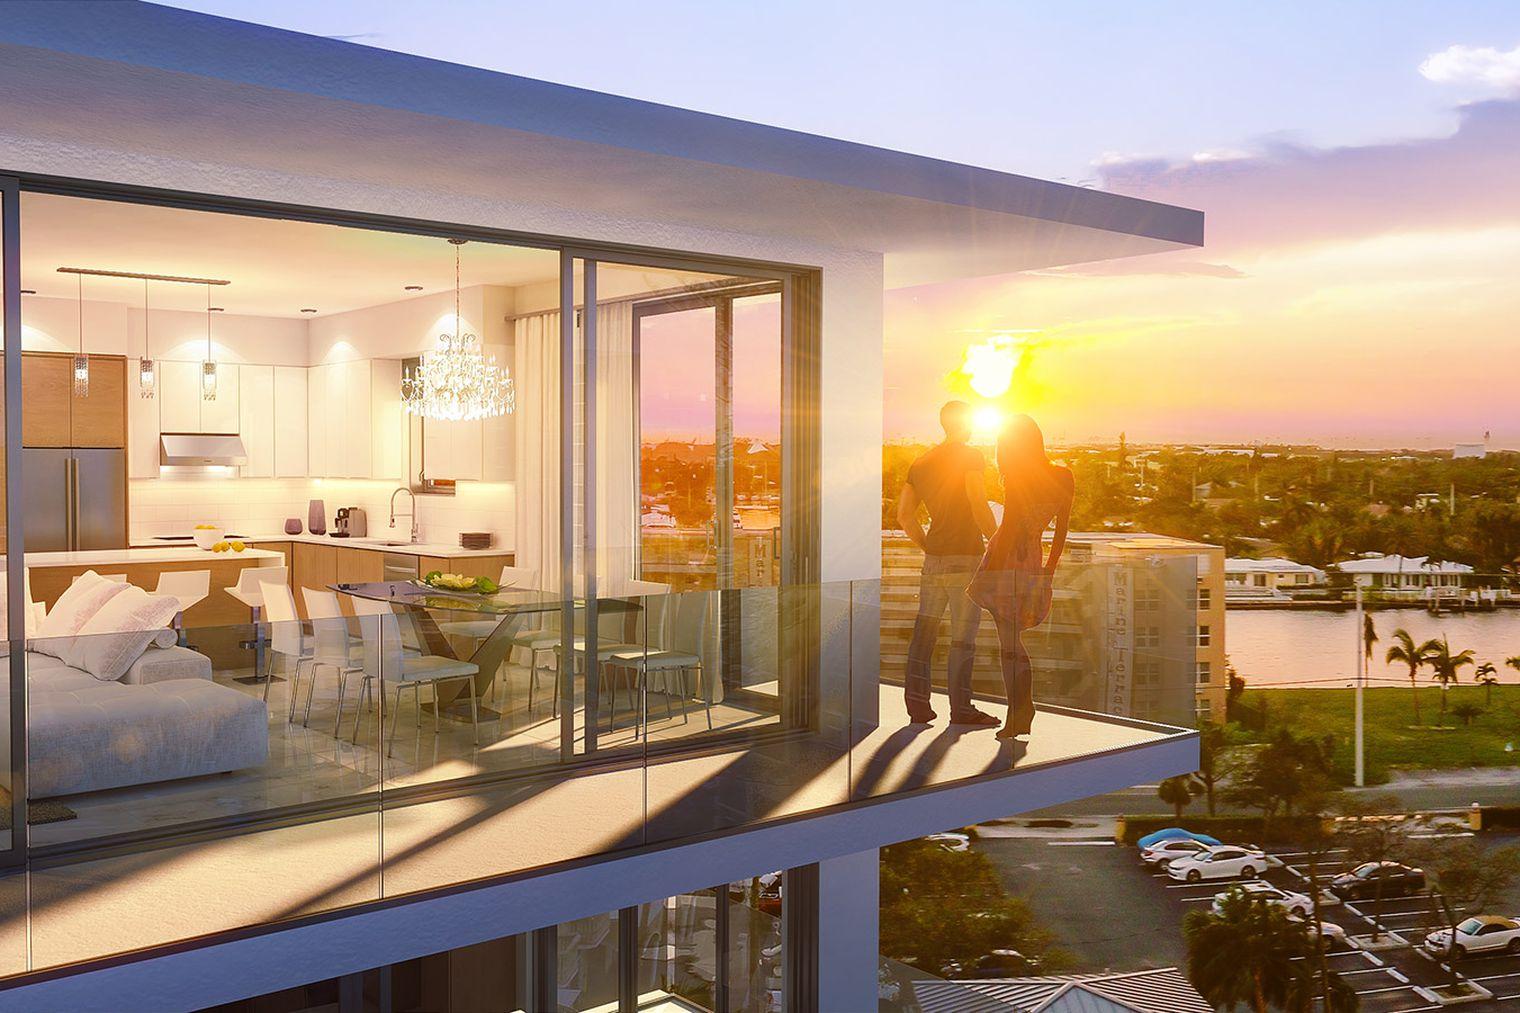 Aspire Real Estate Development To Break Ground On Arya Oceanside Residences In March